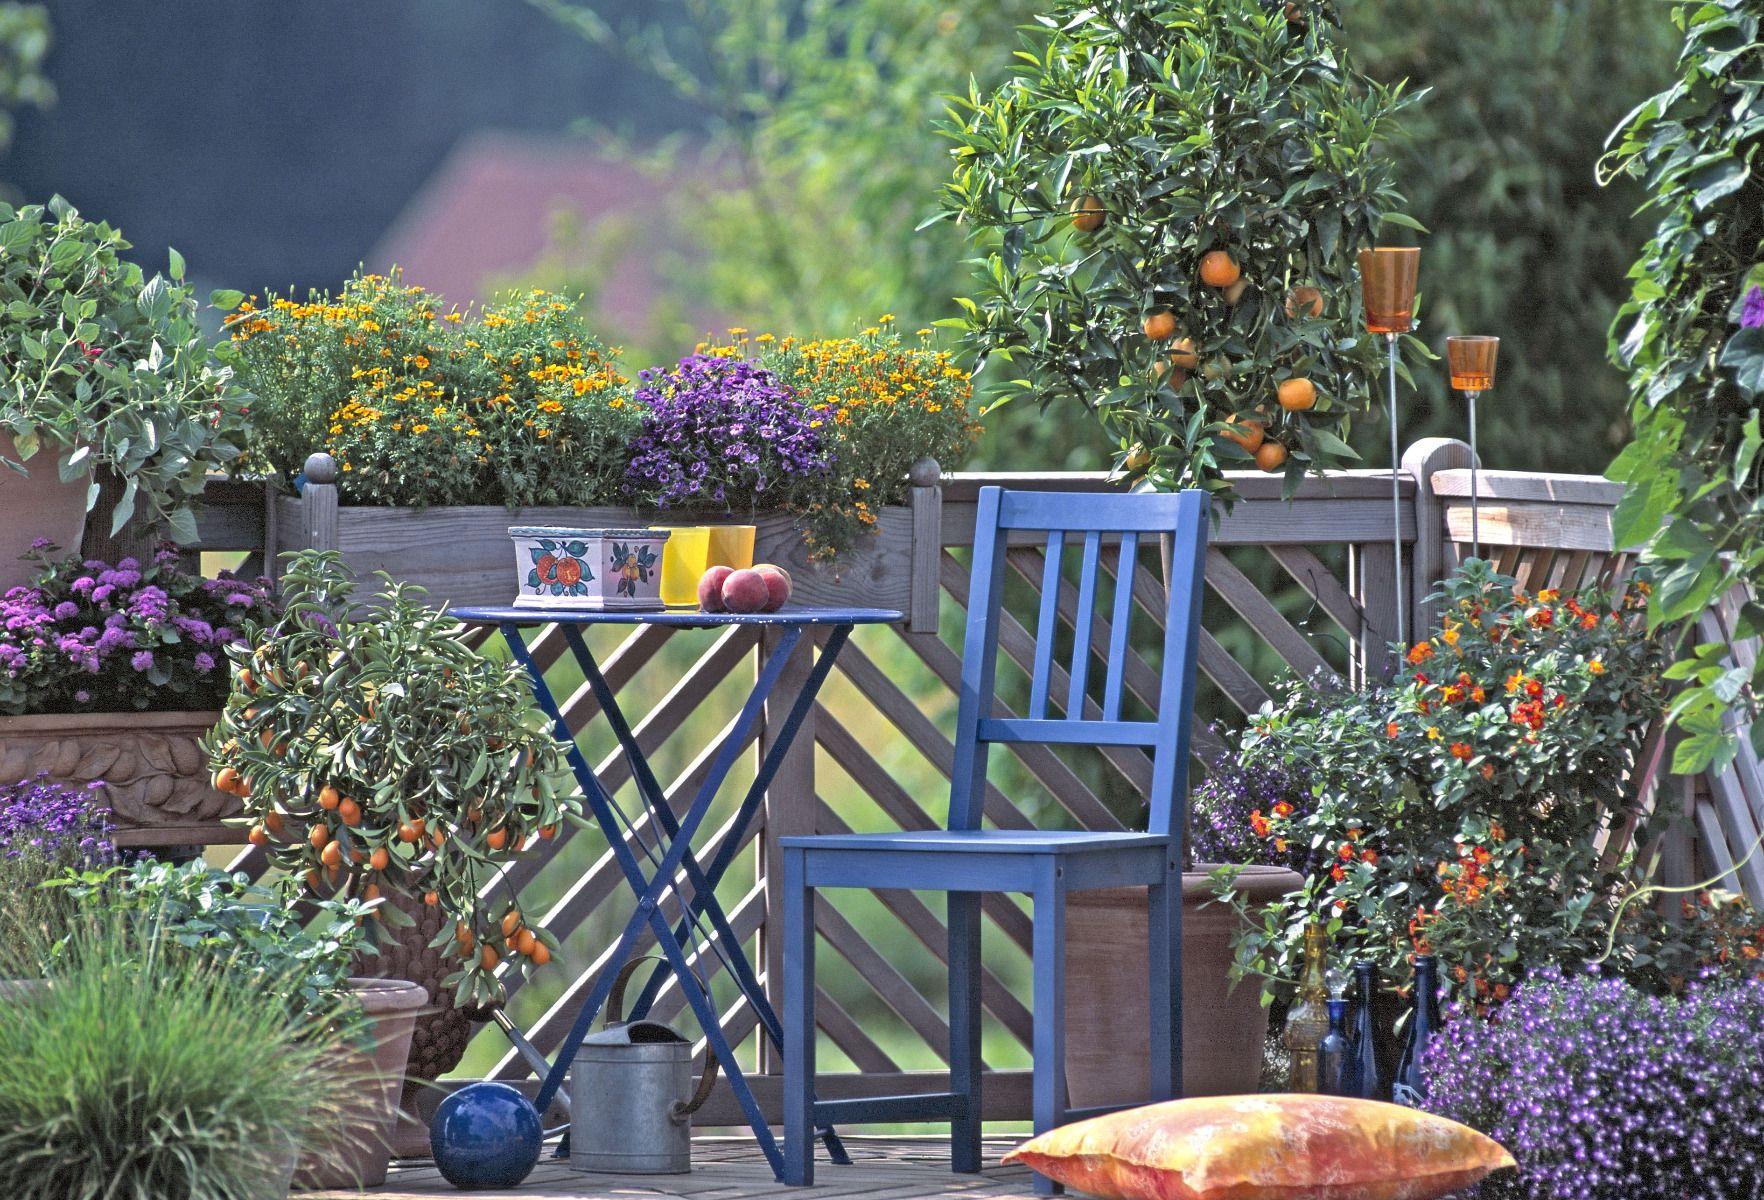 Arbre Fruitier En Pot Interieur arbre fruitier nain : créez votre verger de poche